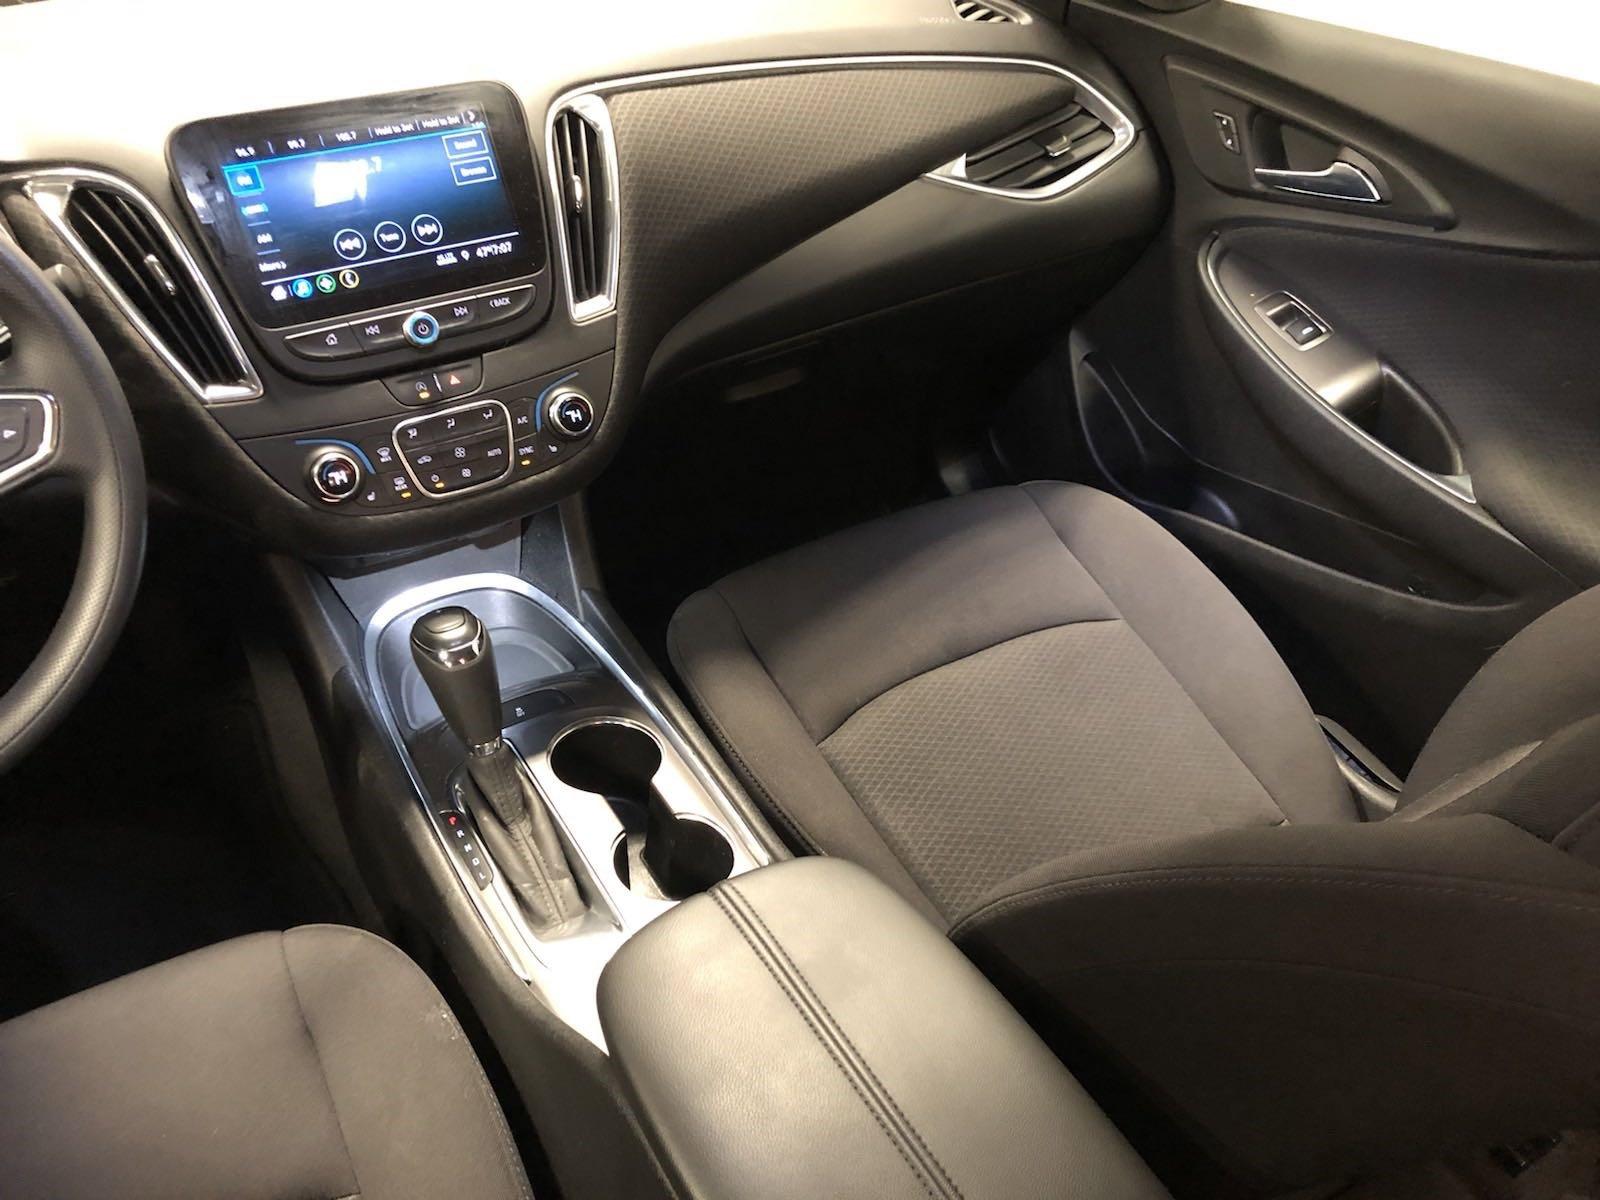 Used 2020 Chevrolet Malibu LT 4dr Car for sale in St Joseph MO